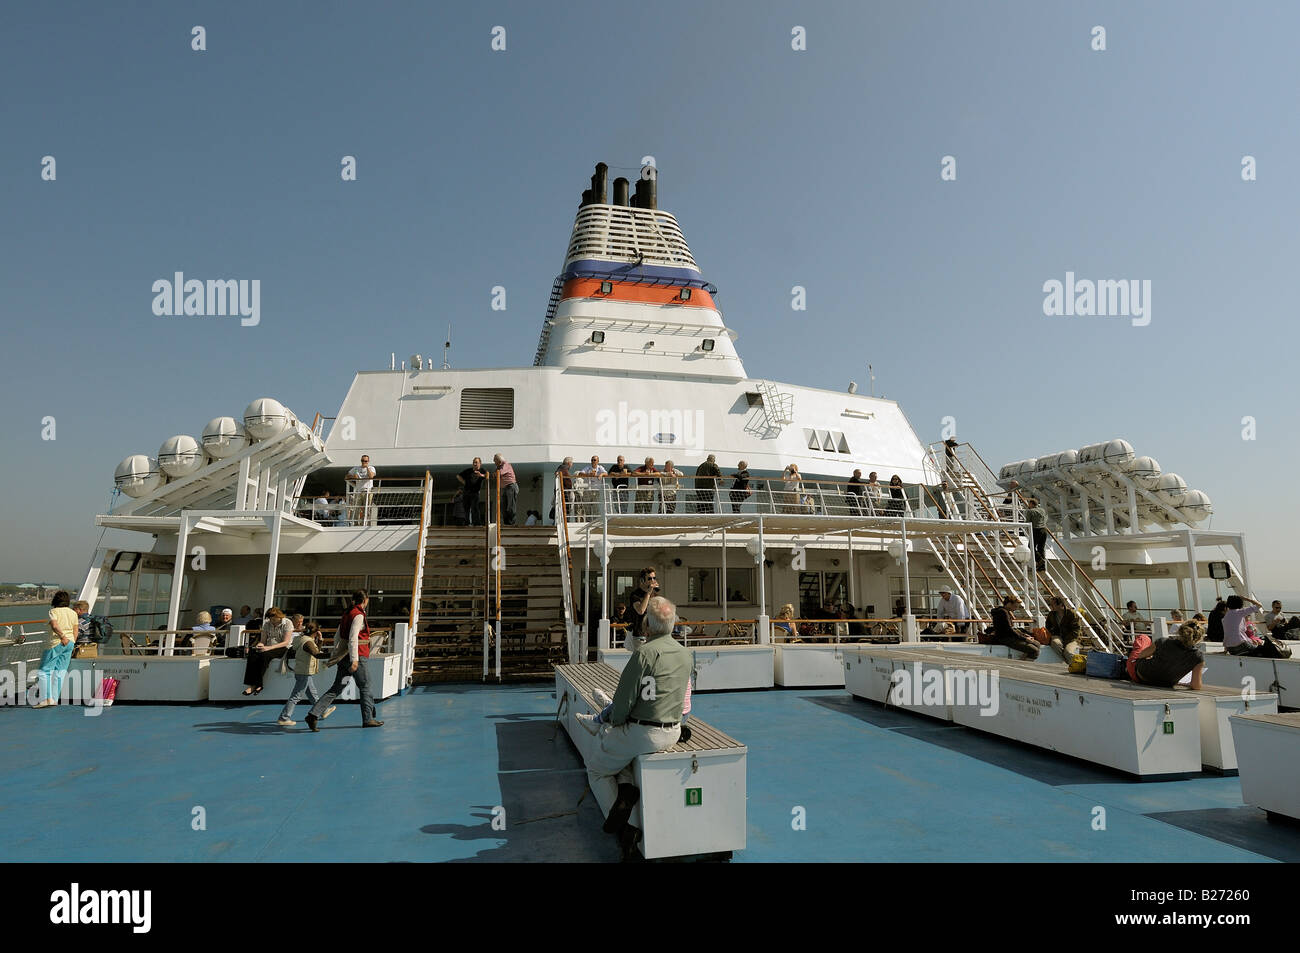 People on deck on board a cross channel ferry - Stock Image